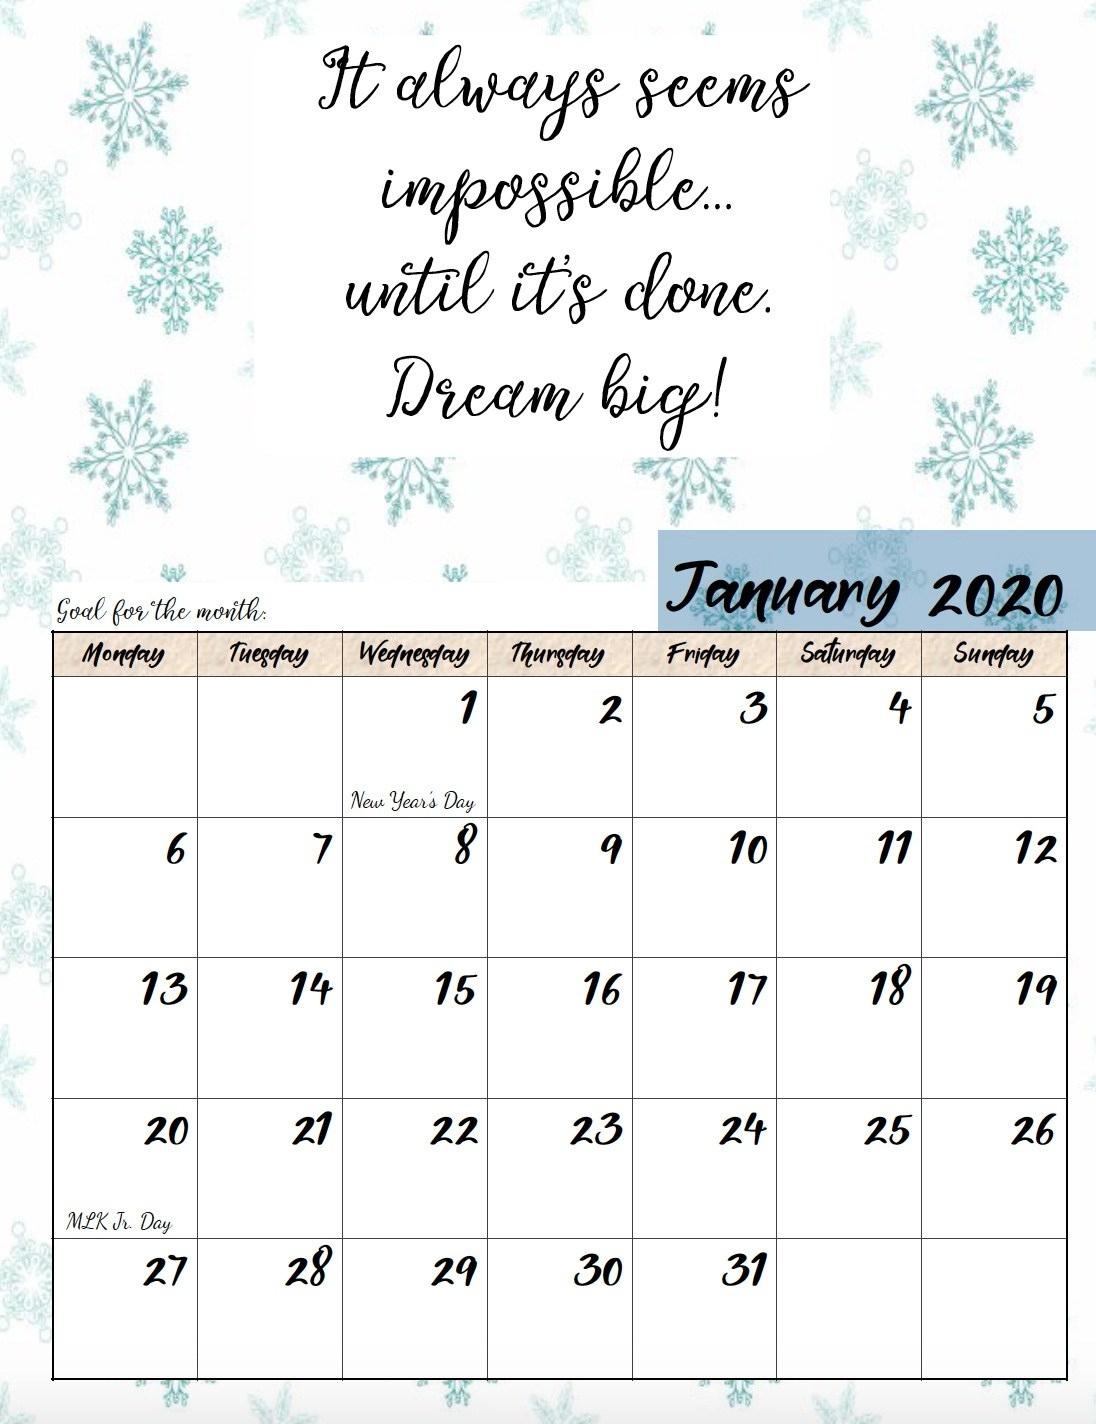 Free Printable 2020 Monday Start Monthly Motivational Calendar Remarkable 2020 Monthly Calendar Monday Start